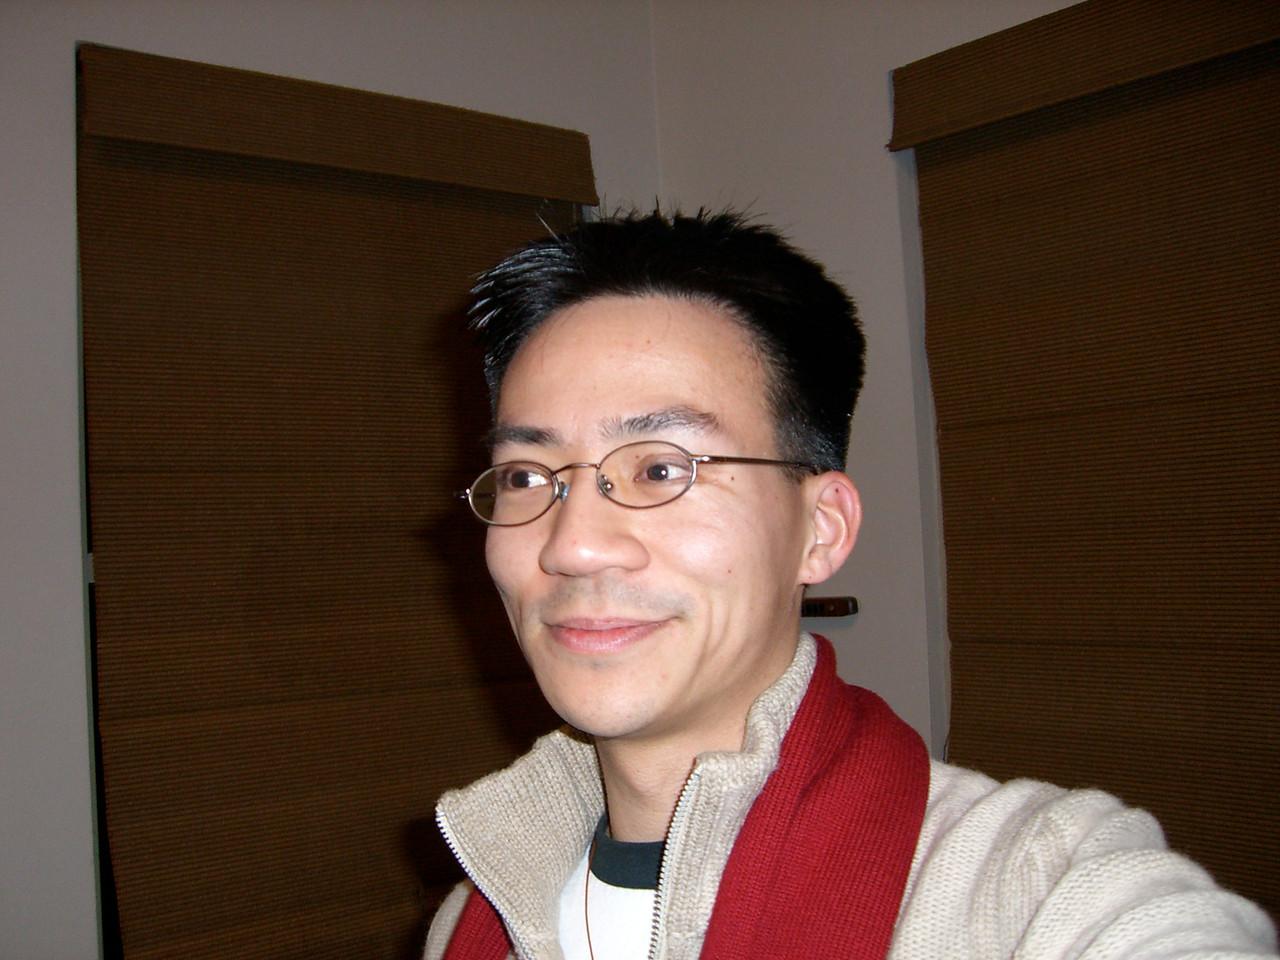 2006 03 16 Thu - Ben Yu alone 'cuz Joseph Tan left the frame